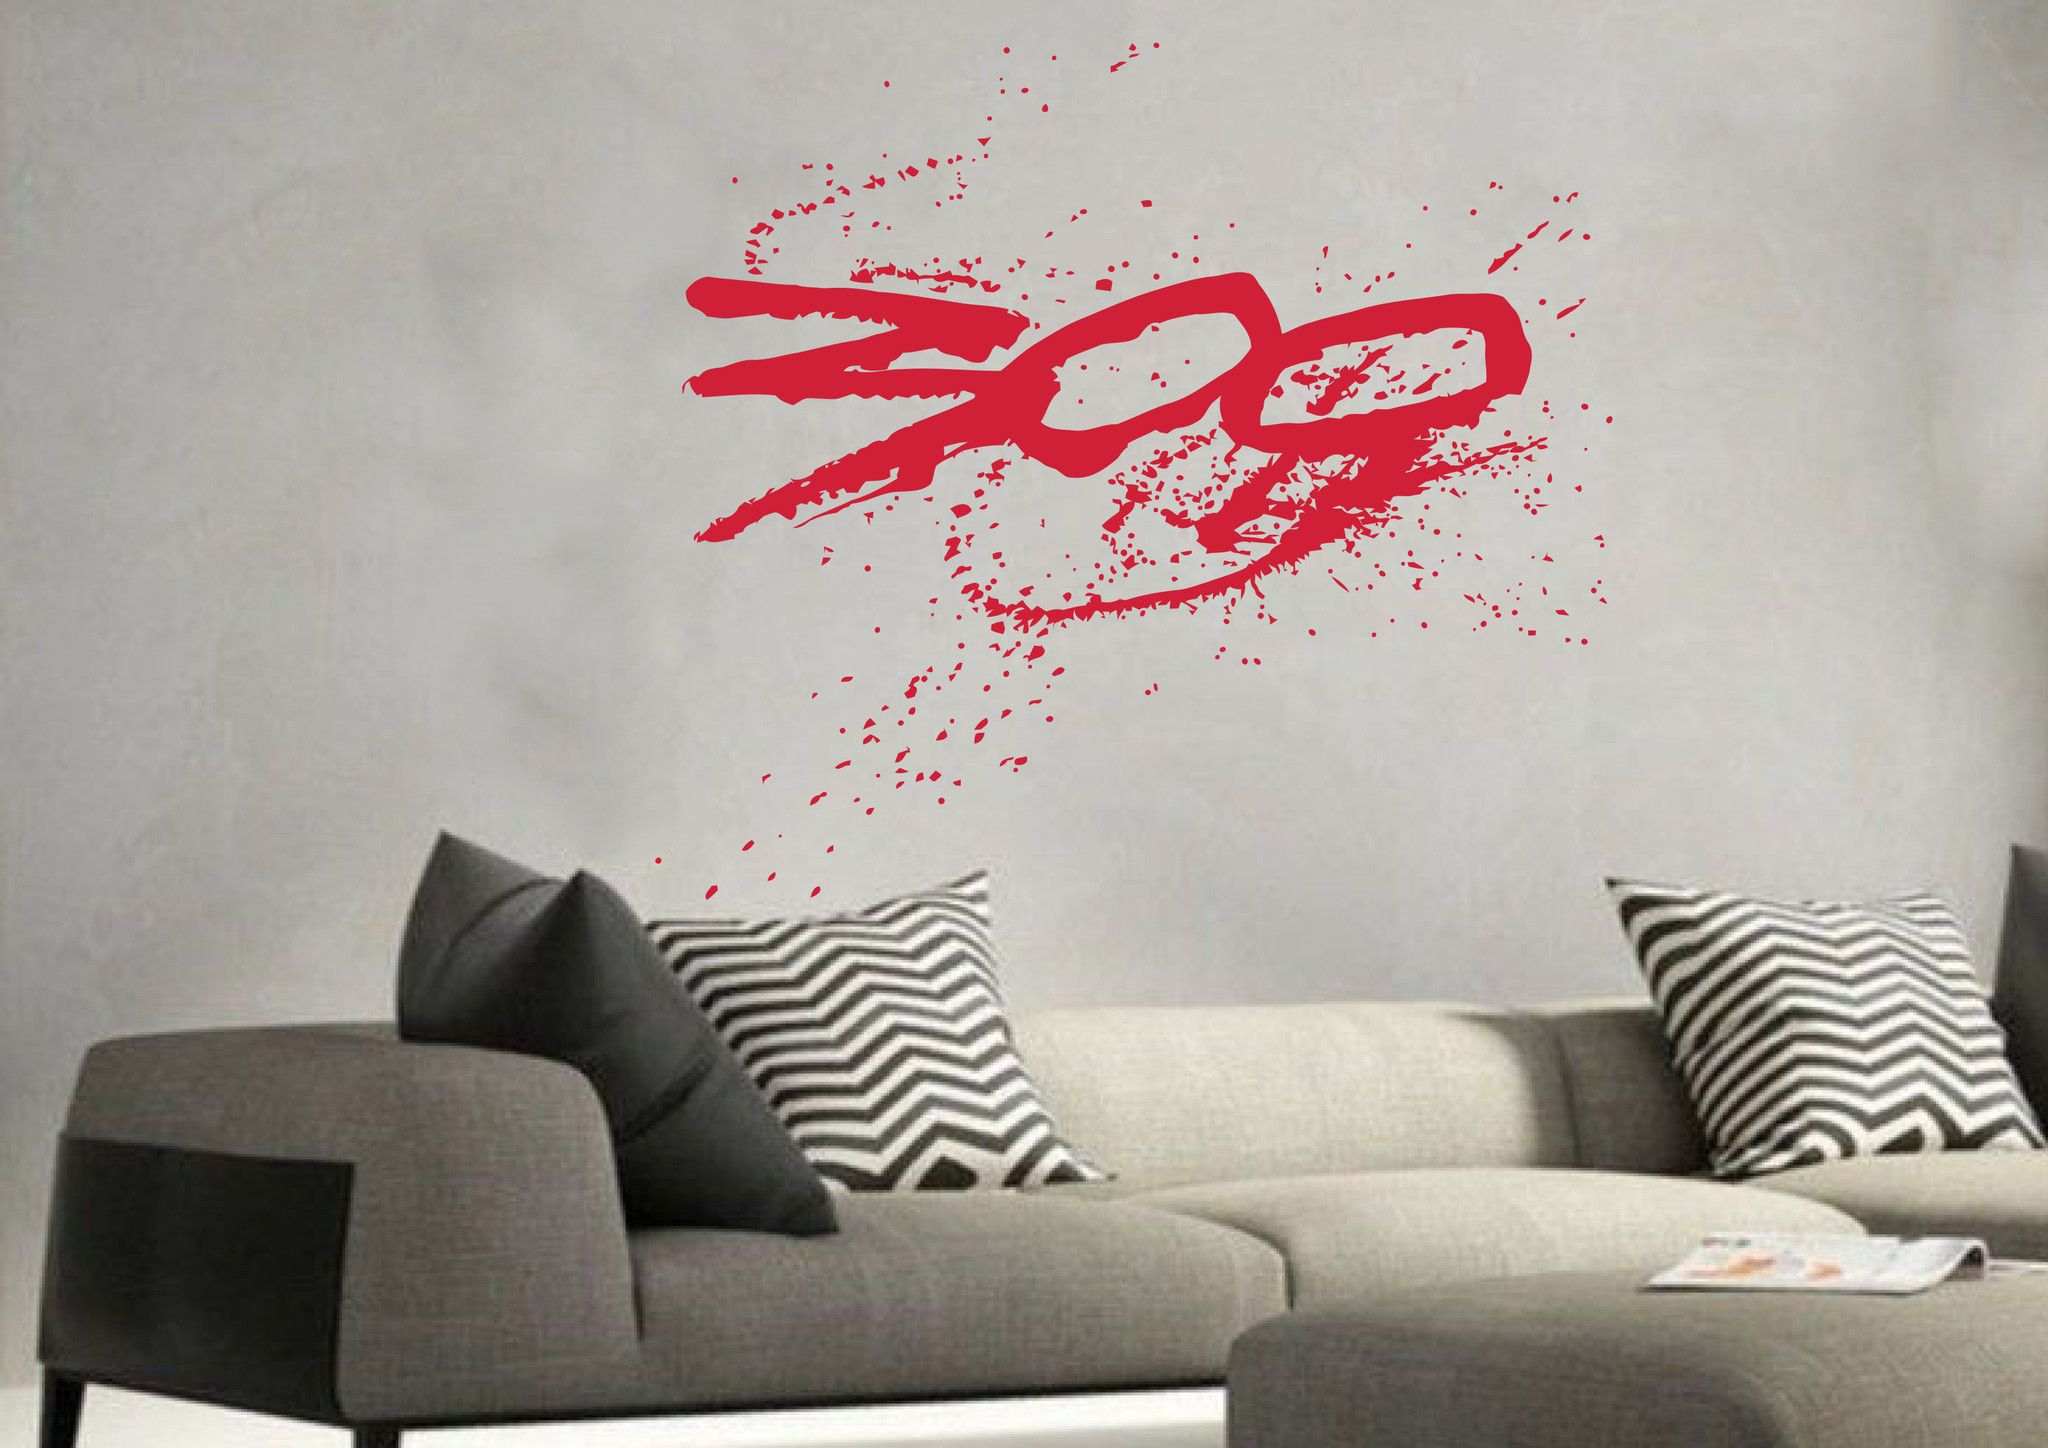 300 Movie Wall Art Sticker – iwallstickers   TV - Movies - Games ...